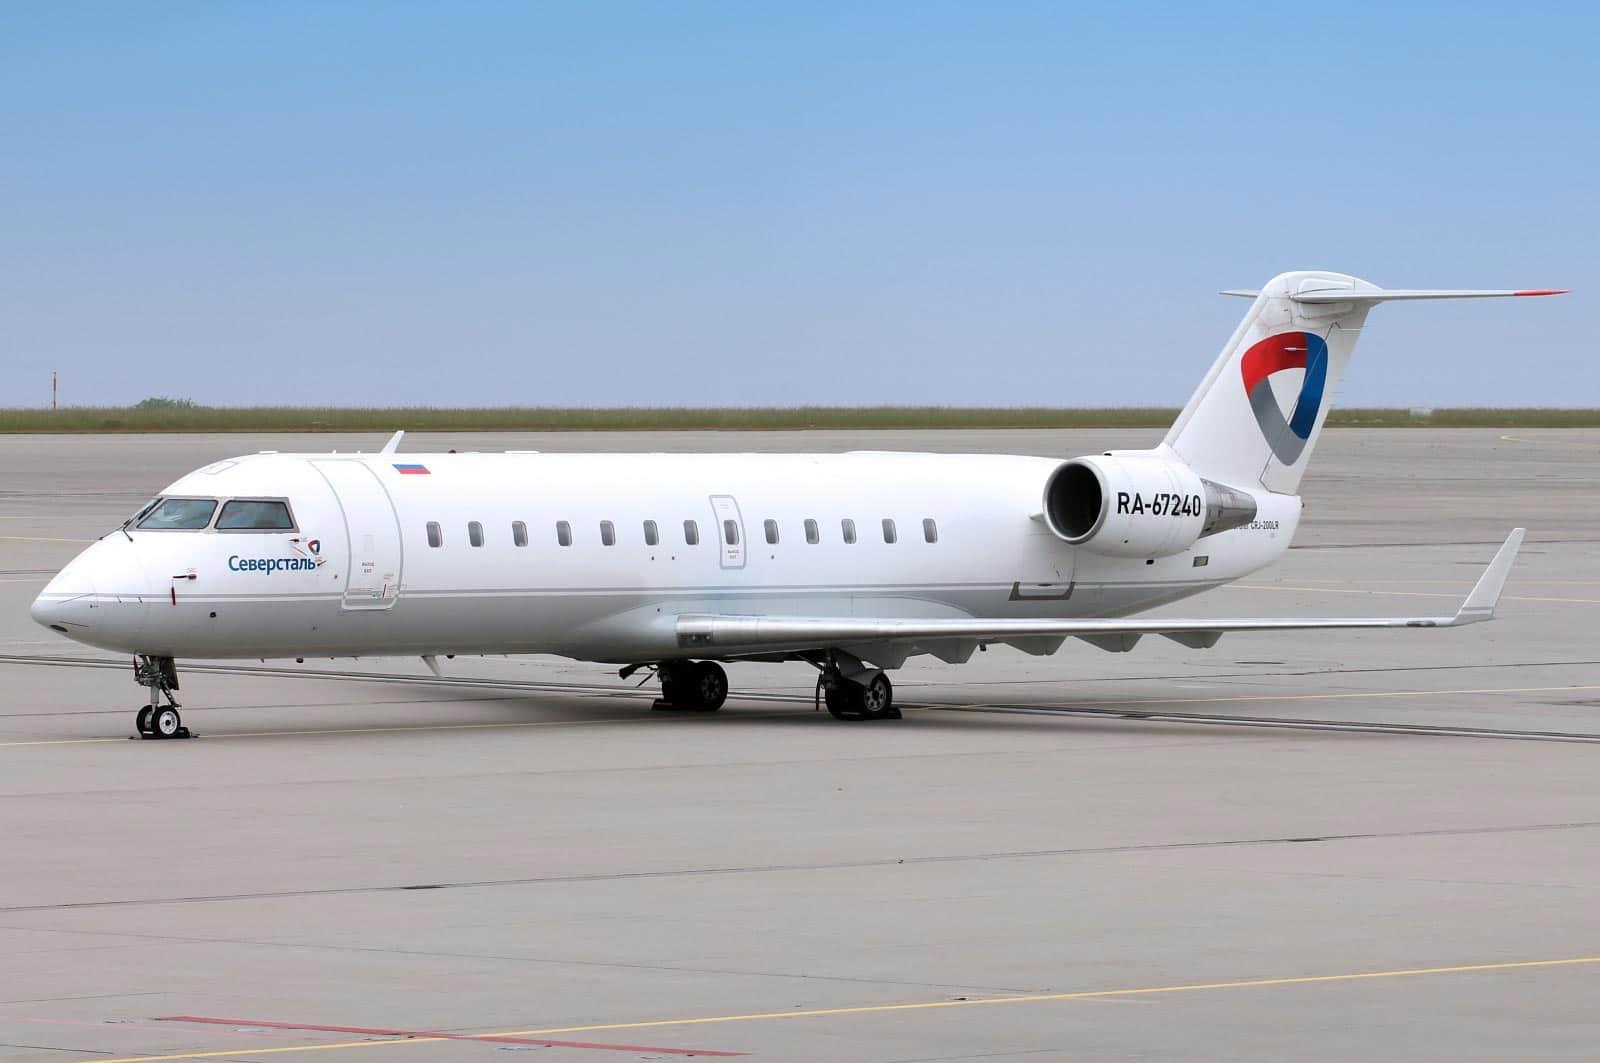 ra-67240-severstal-canadair-cl-600-2b19-regional-jet-crj-200er_PlanespottersNet_700463-1